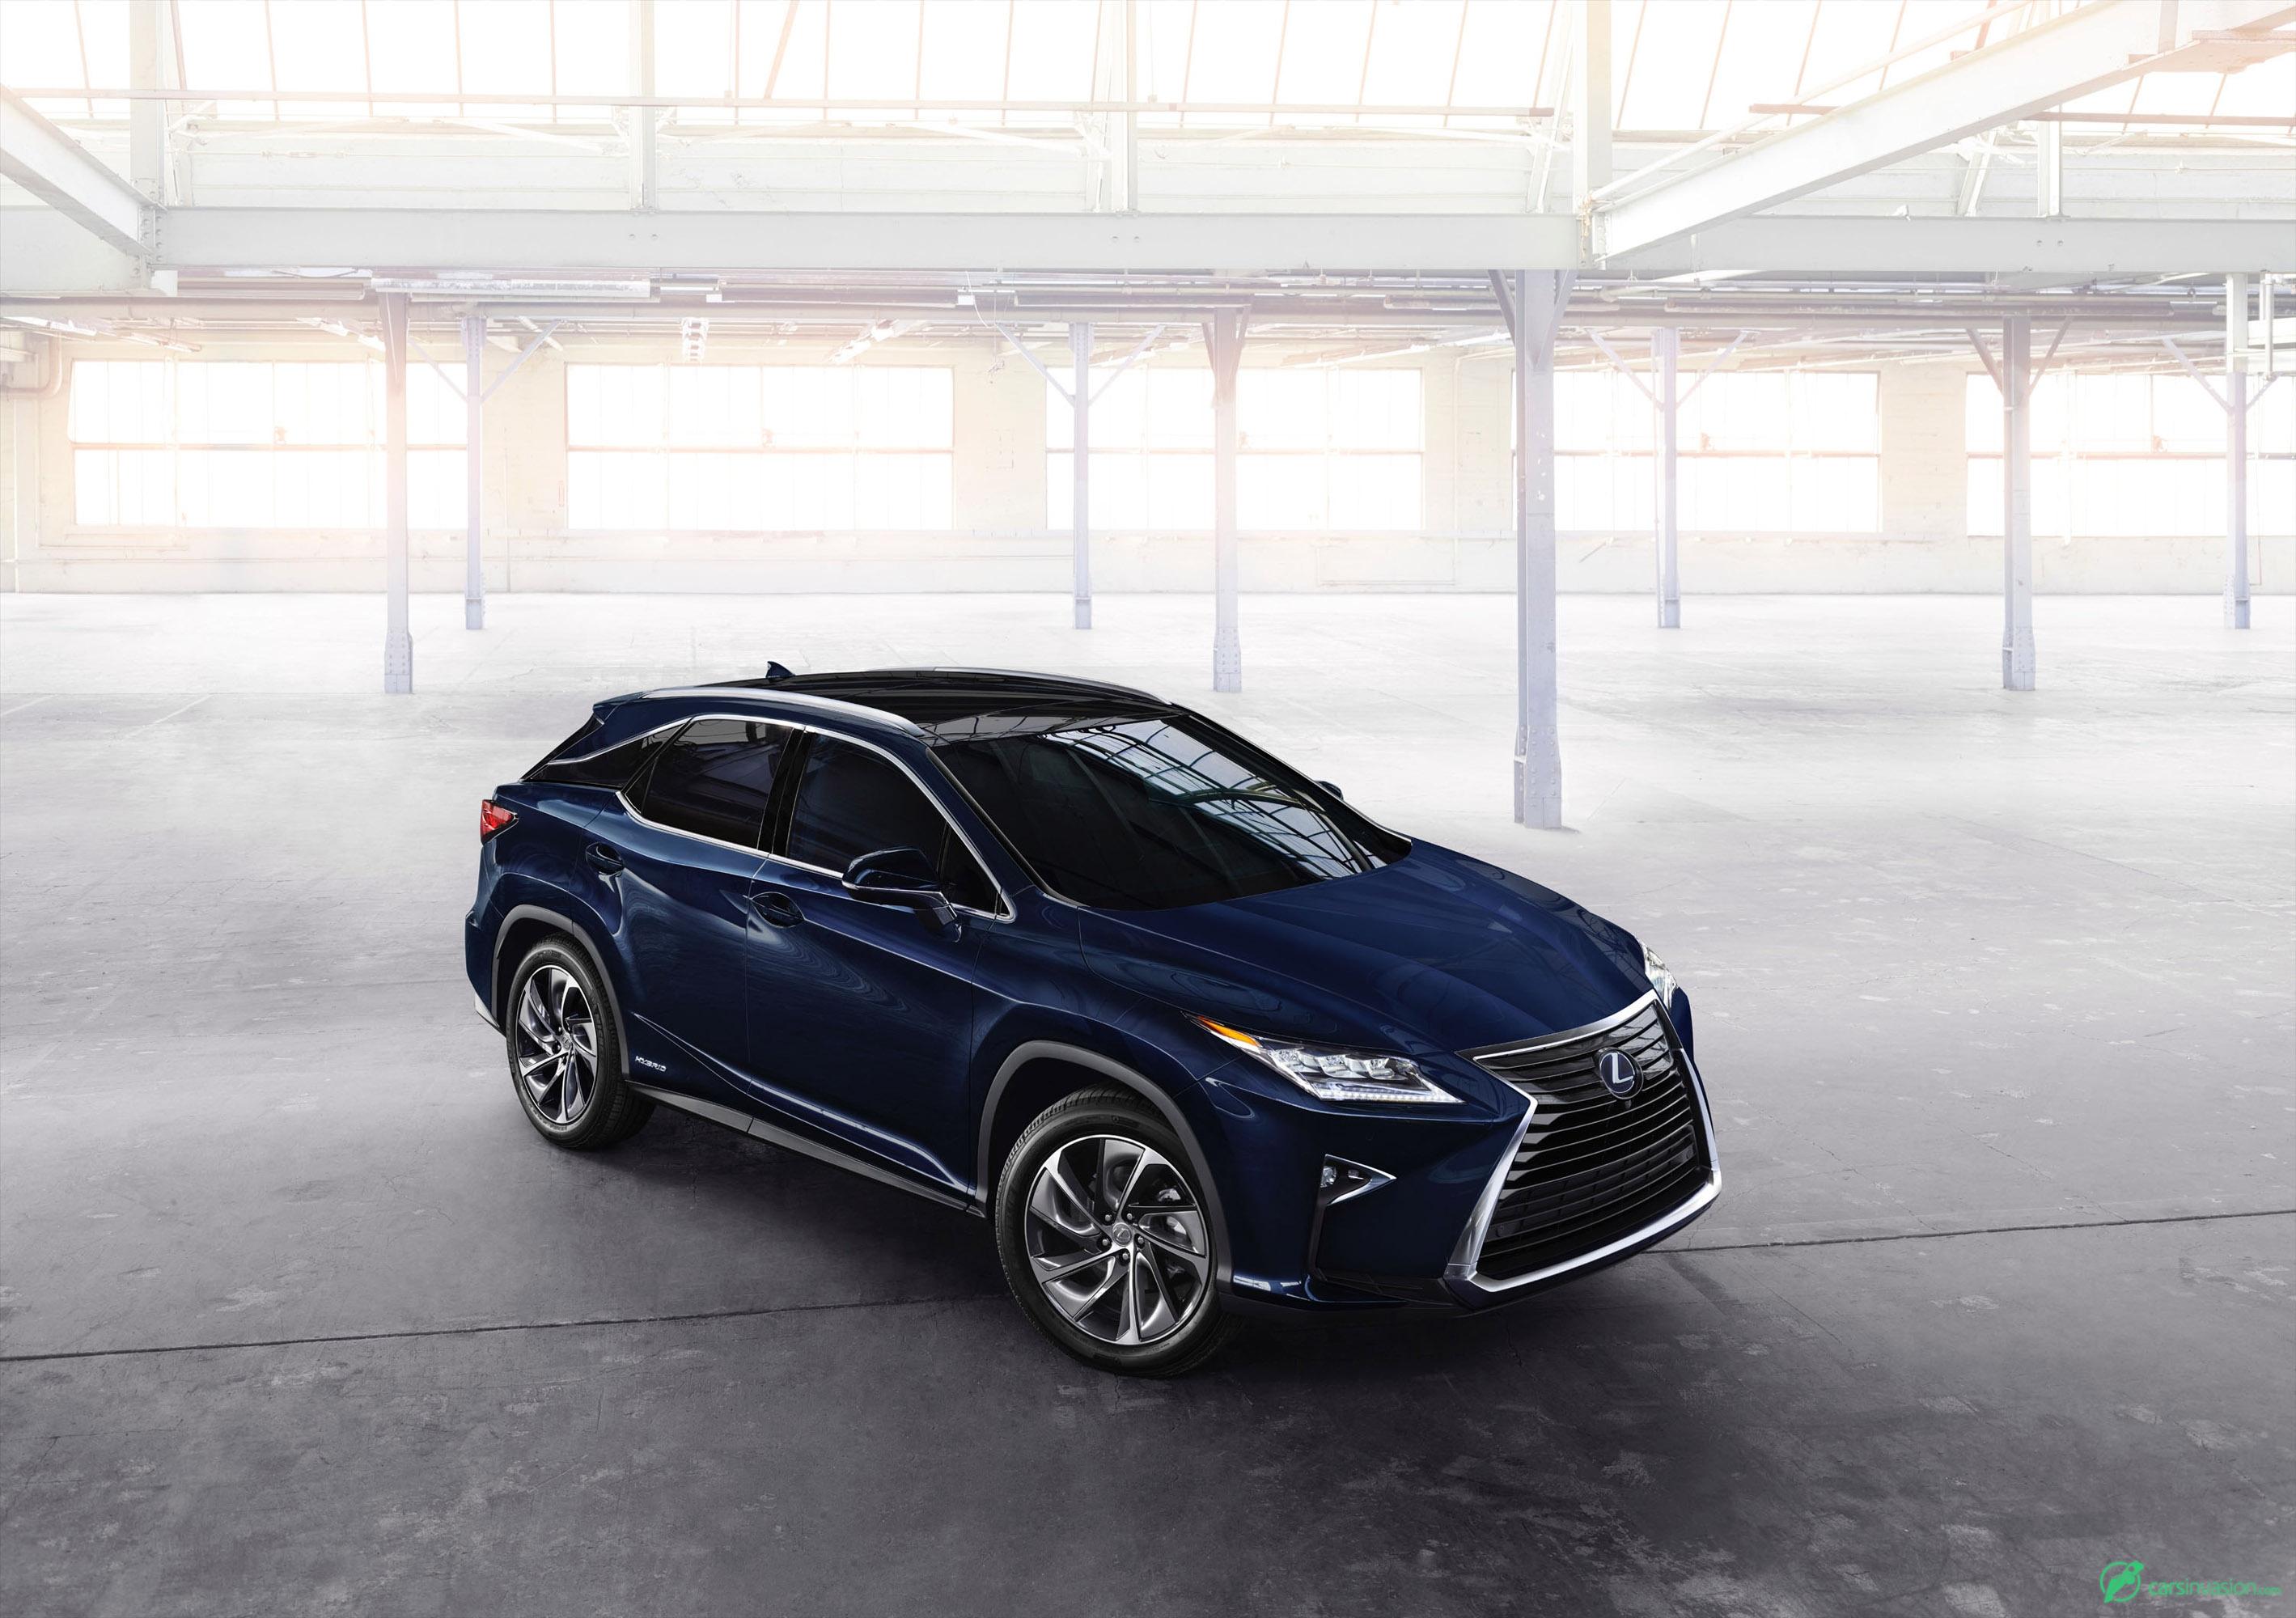 vehicles rx auto sales lexus sportdesign img hma package